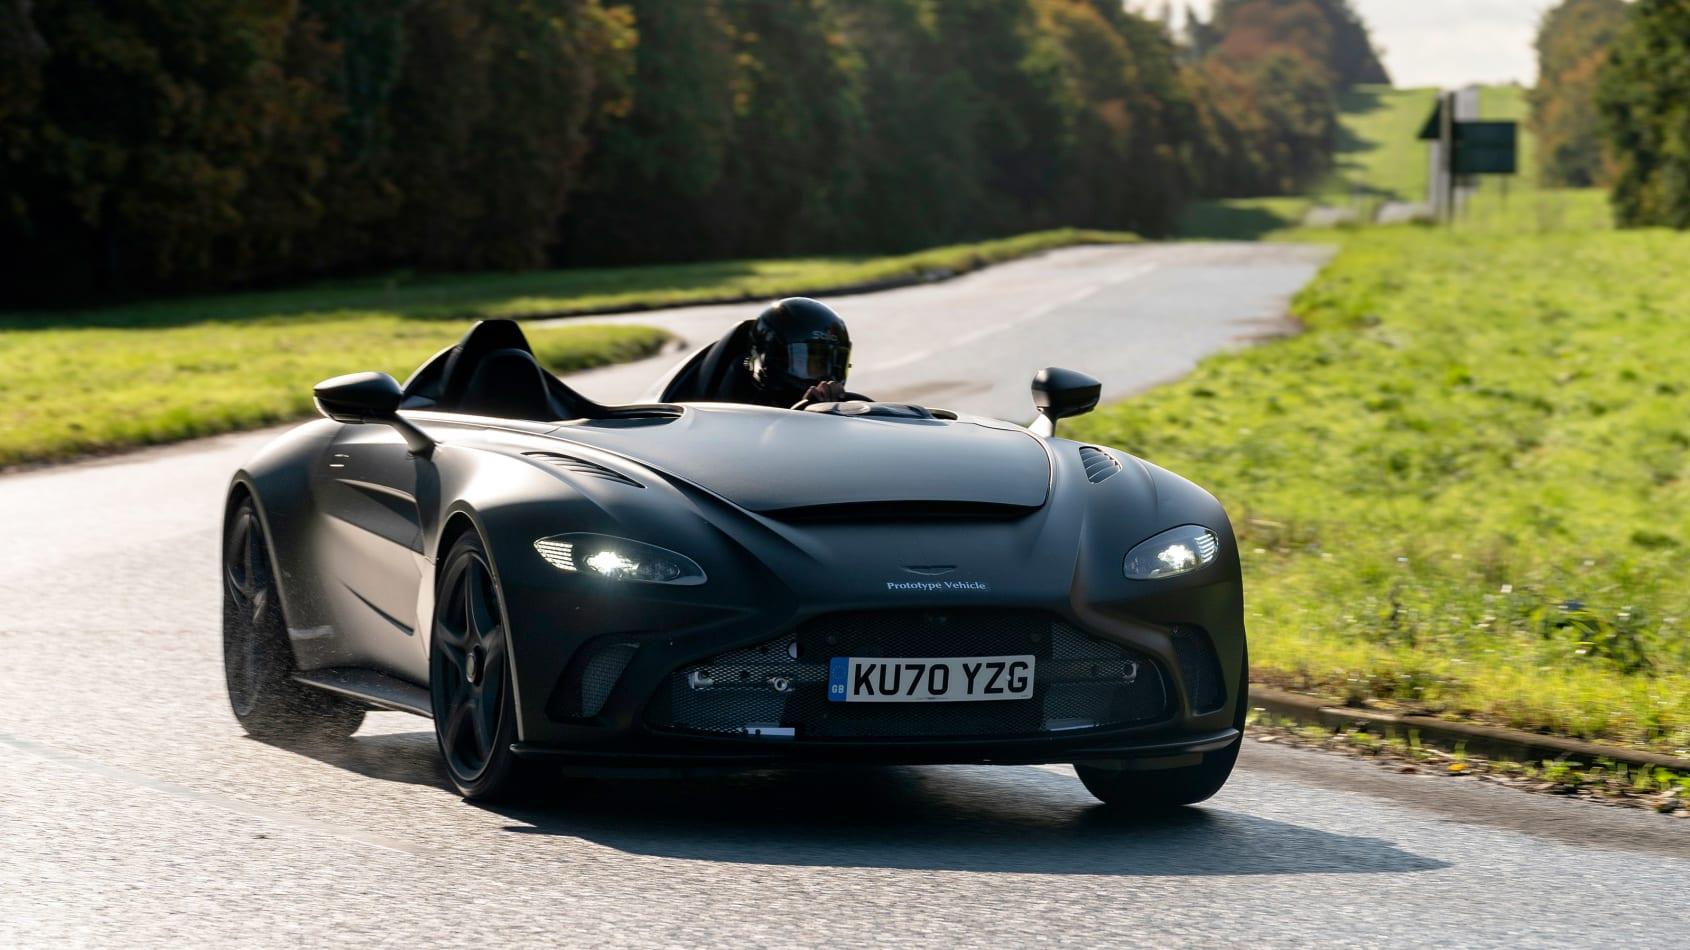 Aston_Martin_V12_Speedster_prototype_0001